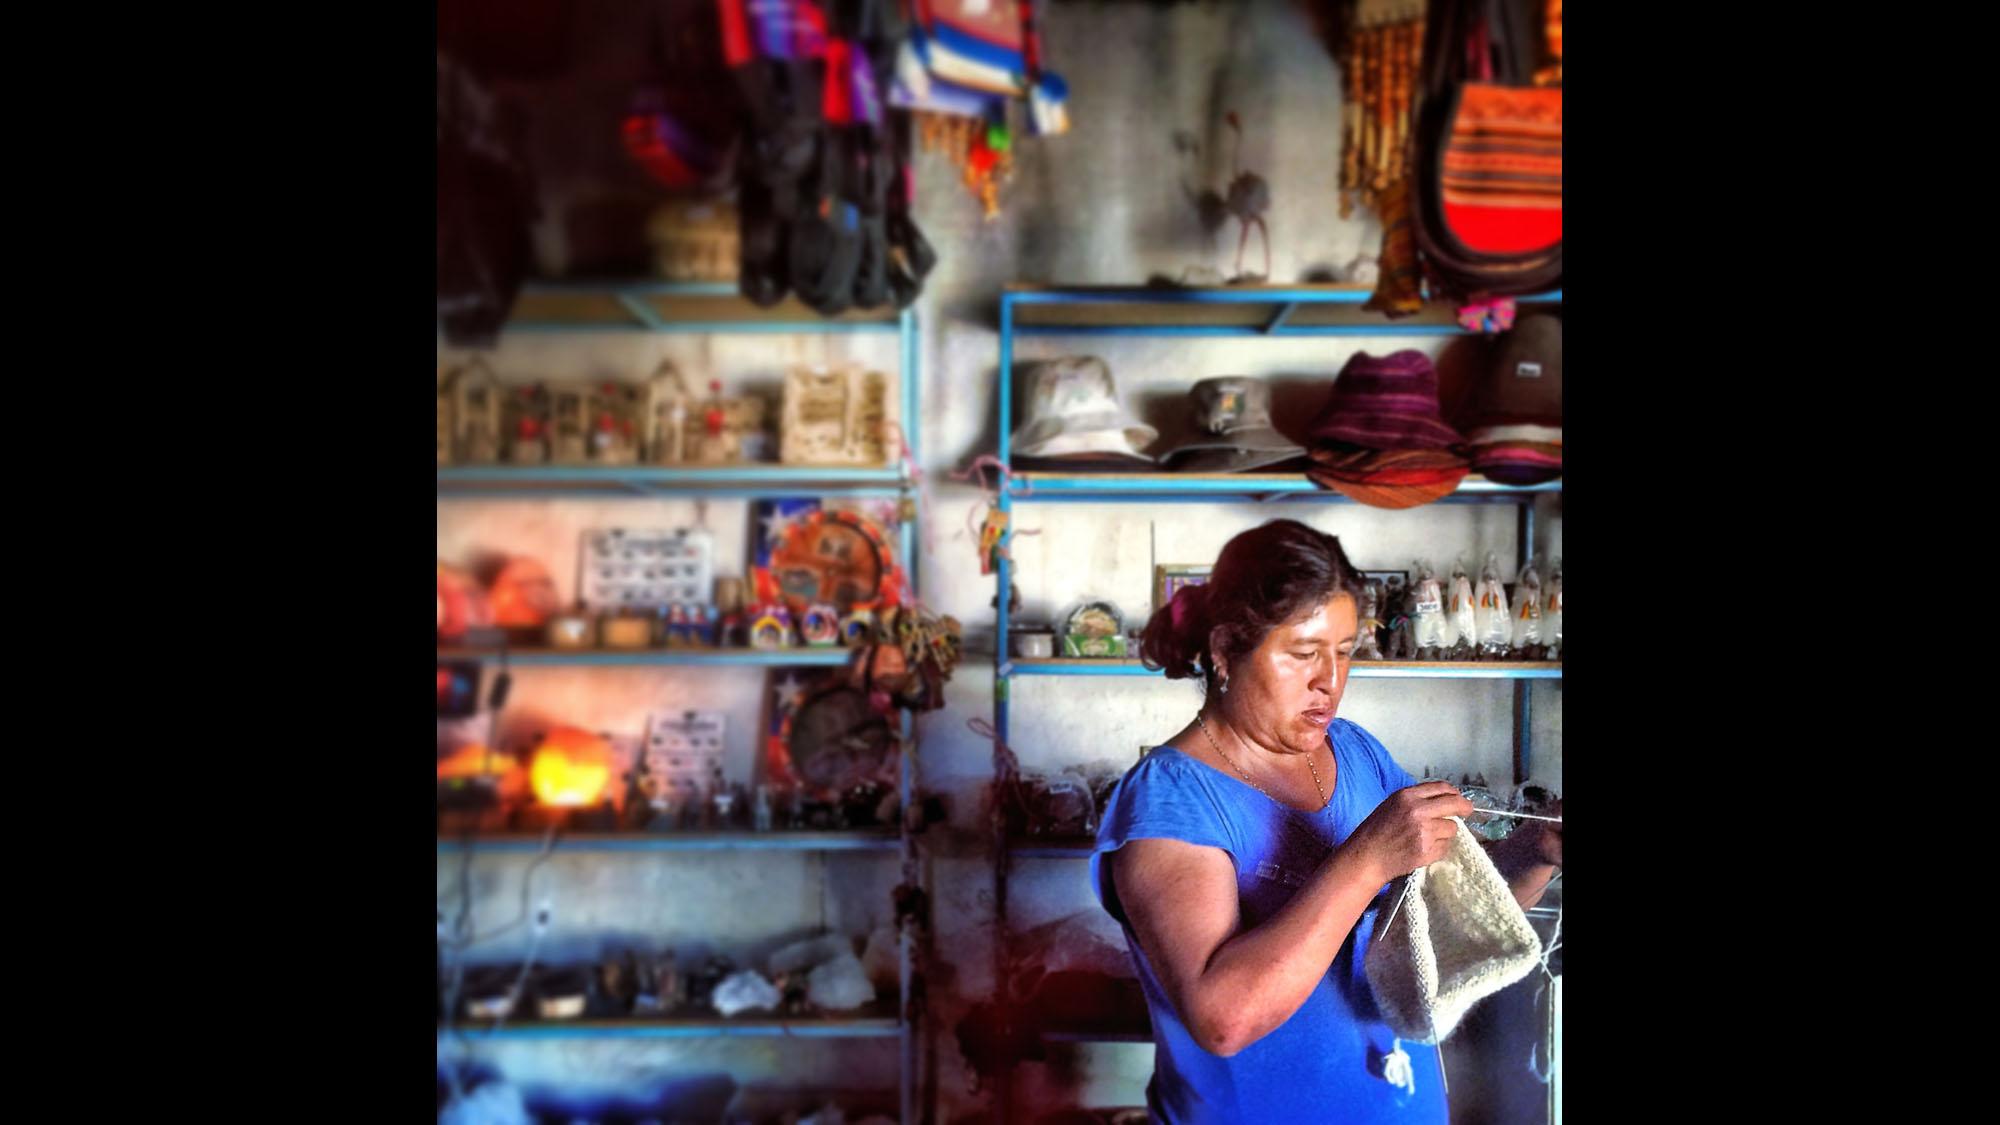 5328c19b45d3 https://www.cnn.com/2015/02/28/us/gallery/unarmed-mexican-national ...